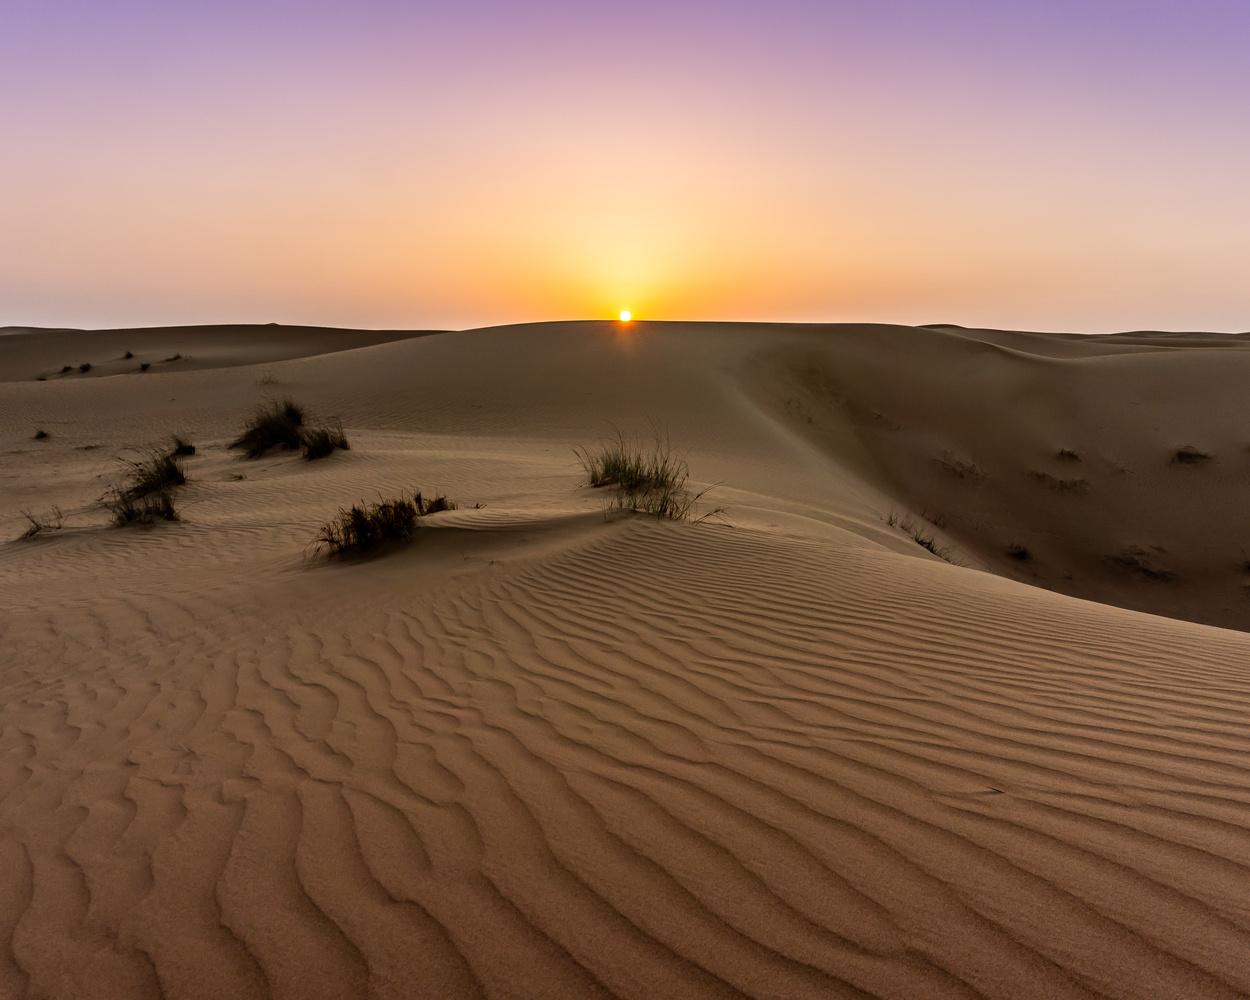 Dunes of Dubai by Dean McGlone